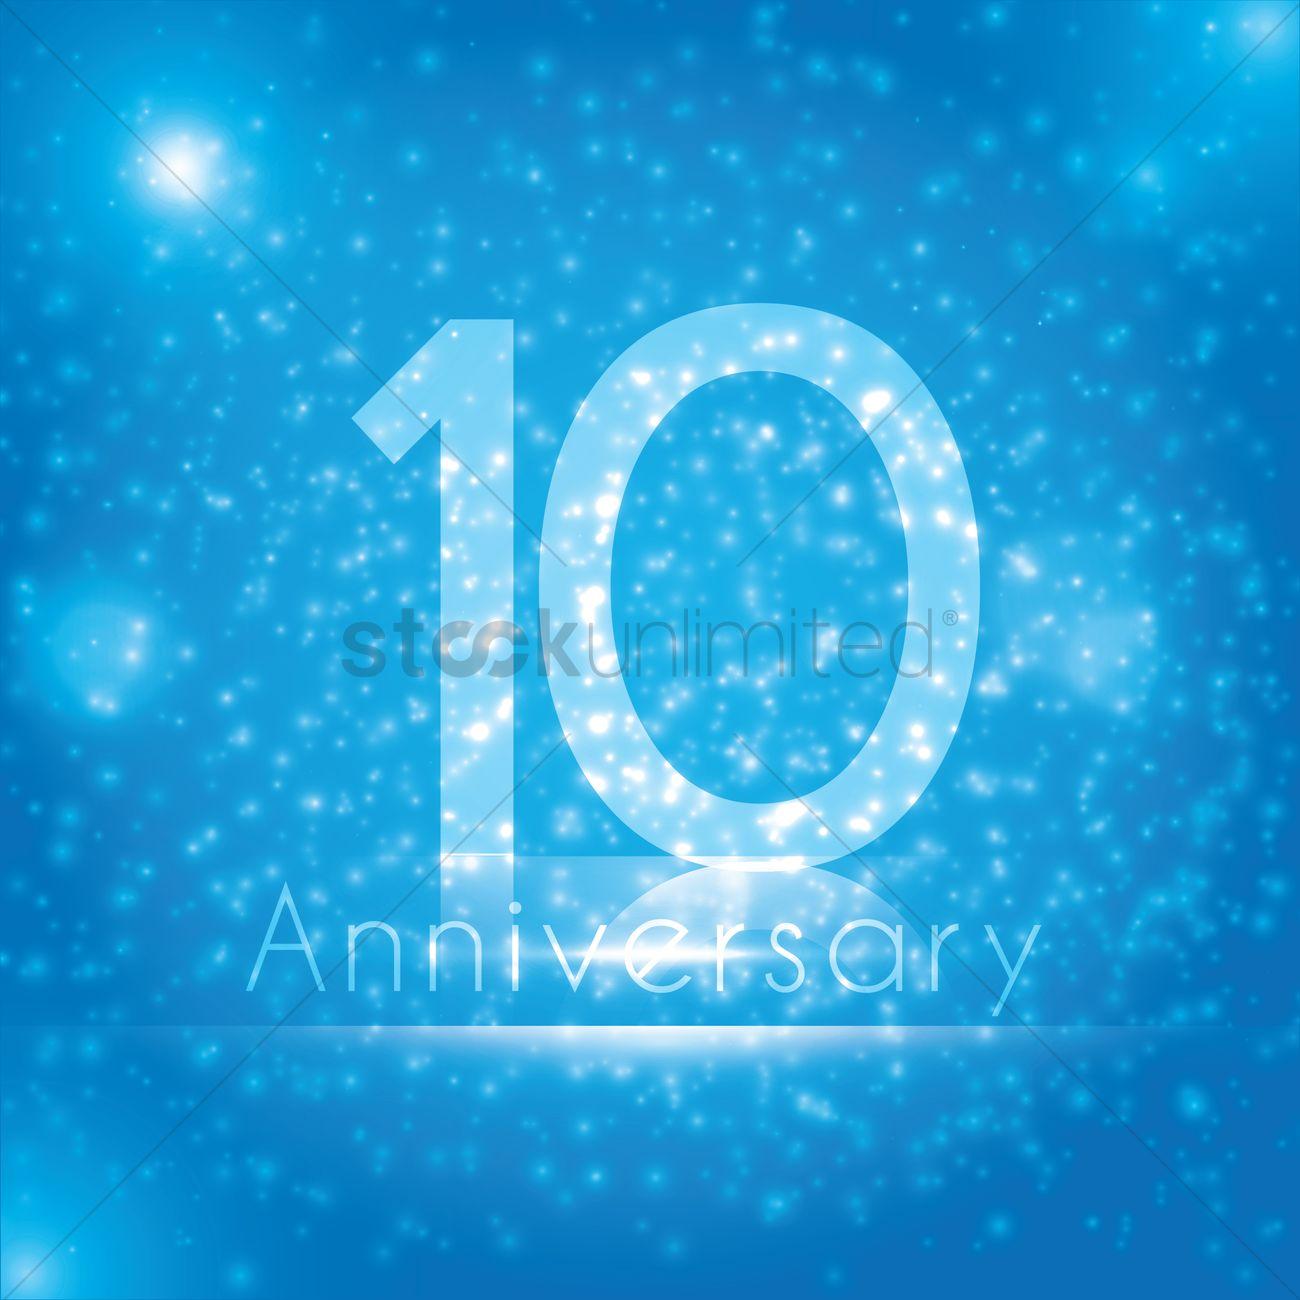 10th anniversary wallpaper vector image 1813135 stockunlimited 10th anniversary wallpaper vector graphic biocorpaavc